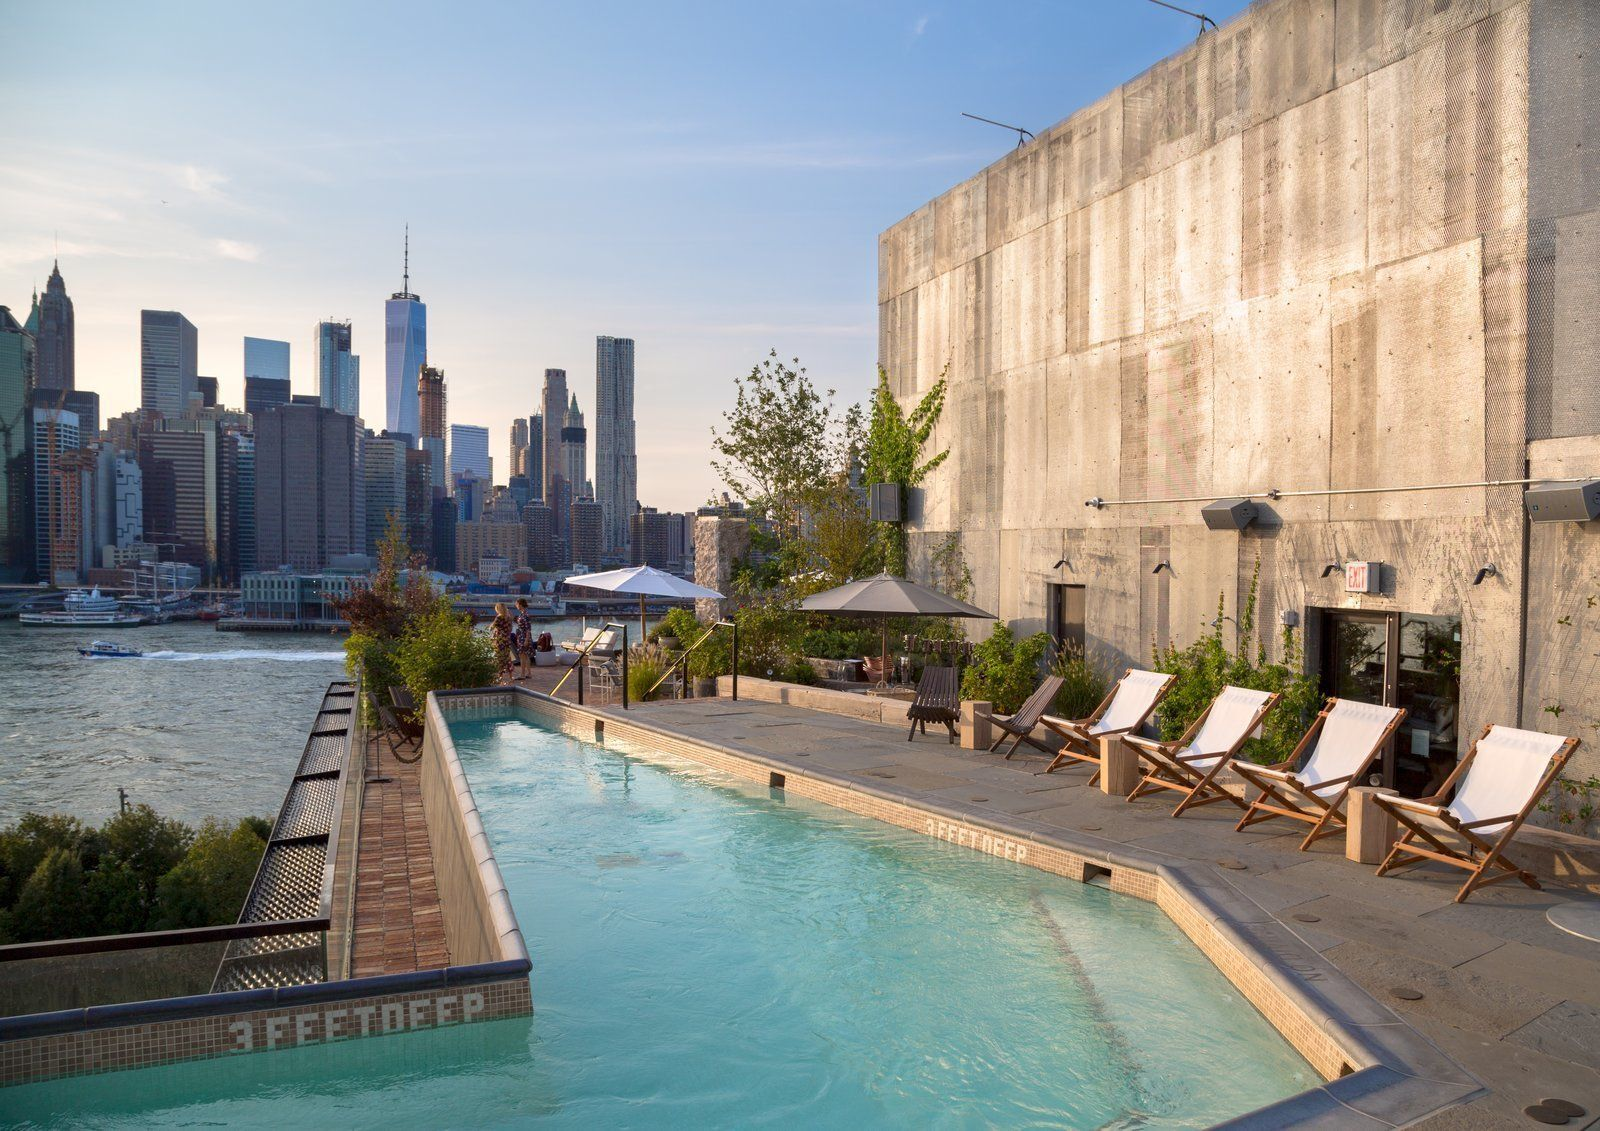 On The Waterfront 1 Hotel Brooklyn Bridge Pool Landscaping New York Landscape Brooklyn Hotels